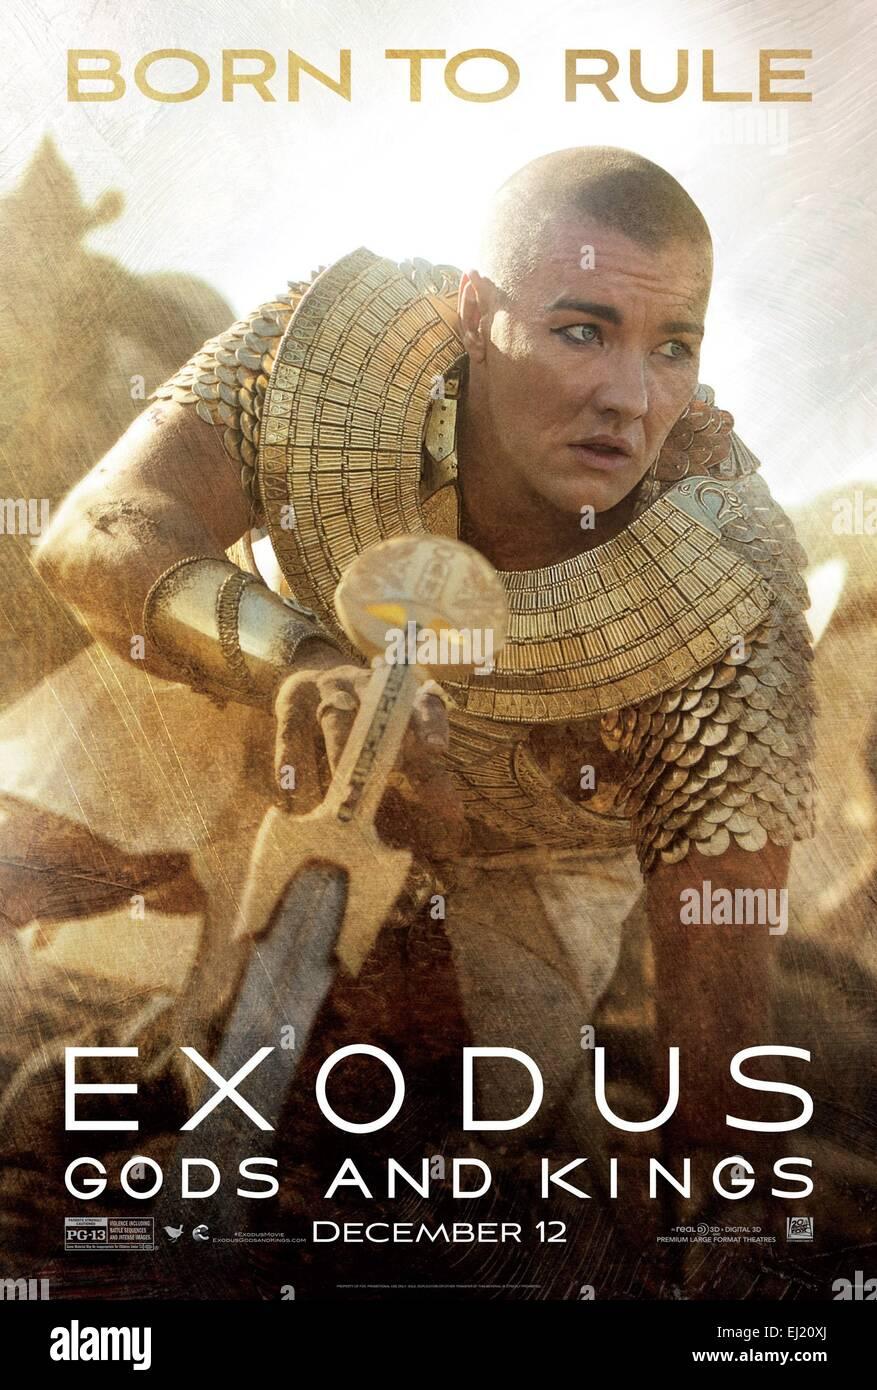 Exodus: Gods and Kings Year: 2014 USA / UK Director : Ridley Scott Joel Edgerton Movie poster (USA) - Stock Image